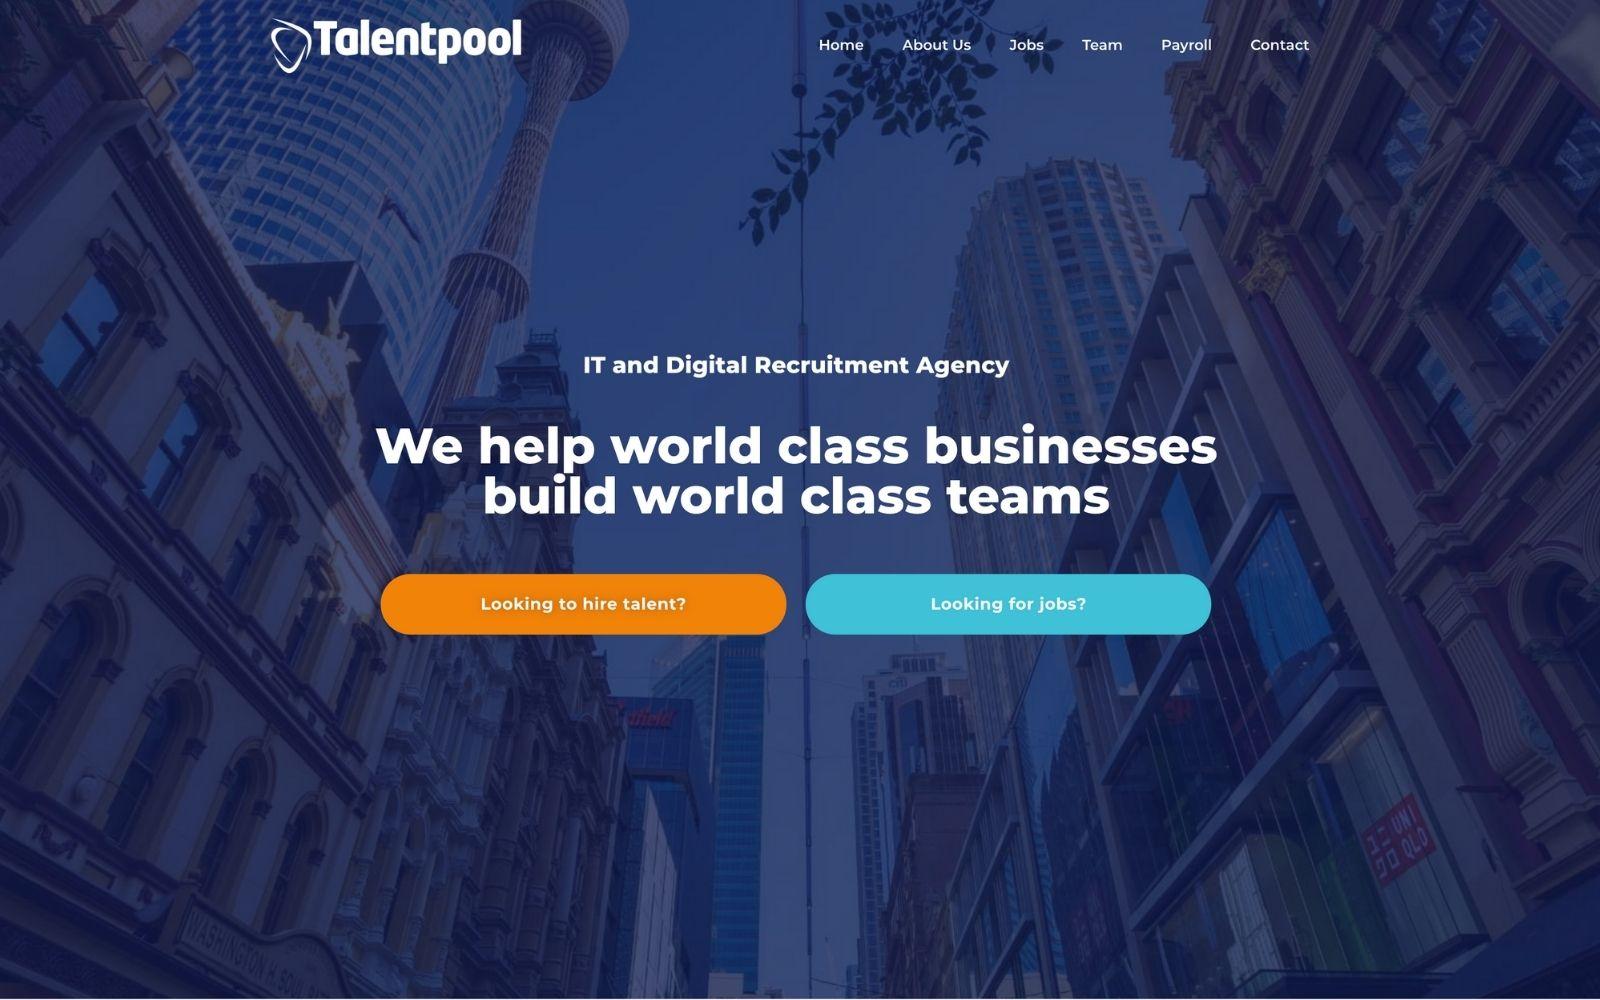 talentpool-home